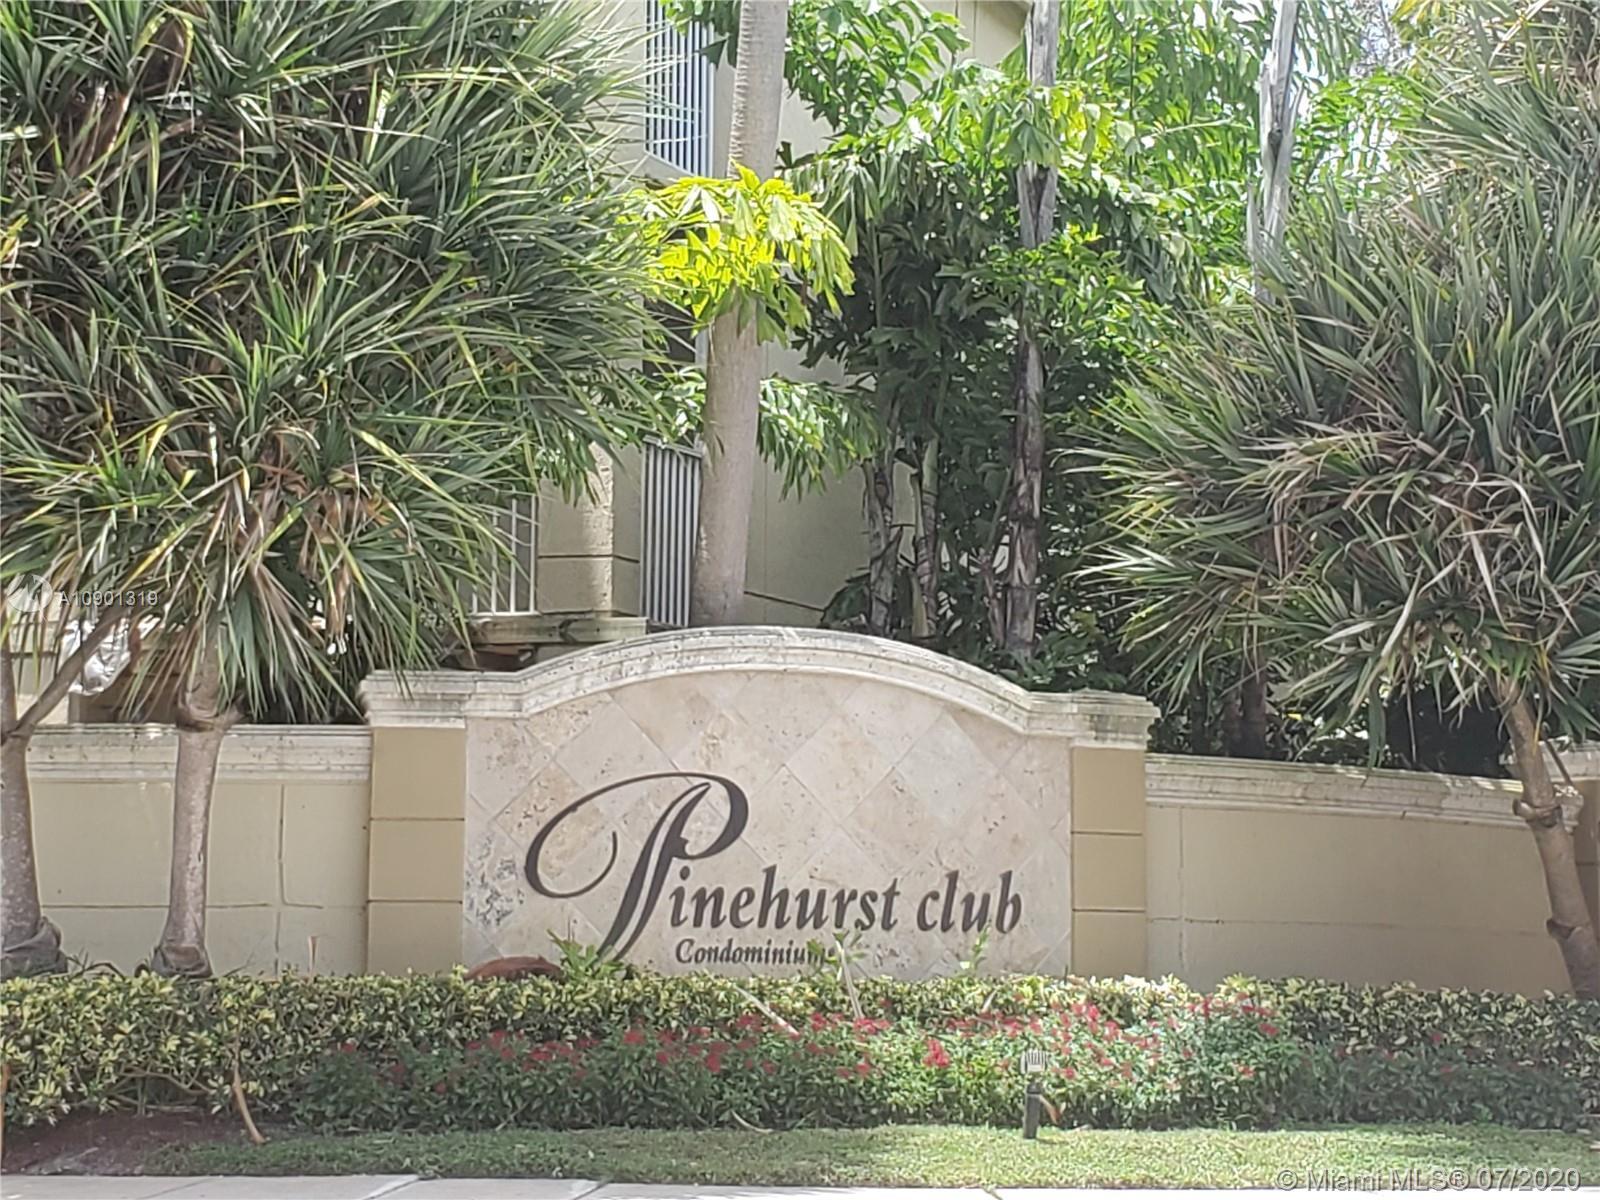 Pinehurst, 460 S Park Rd Unit 6-109, Hollywood, Florida 33021